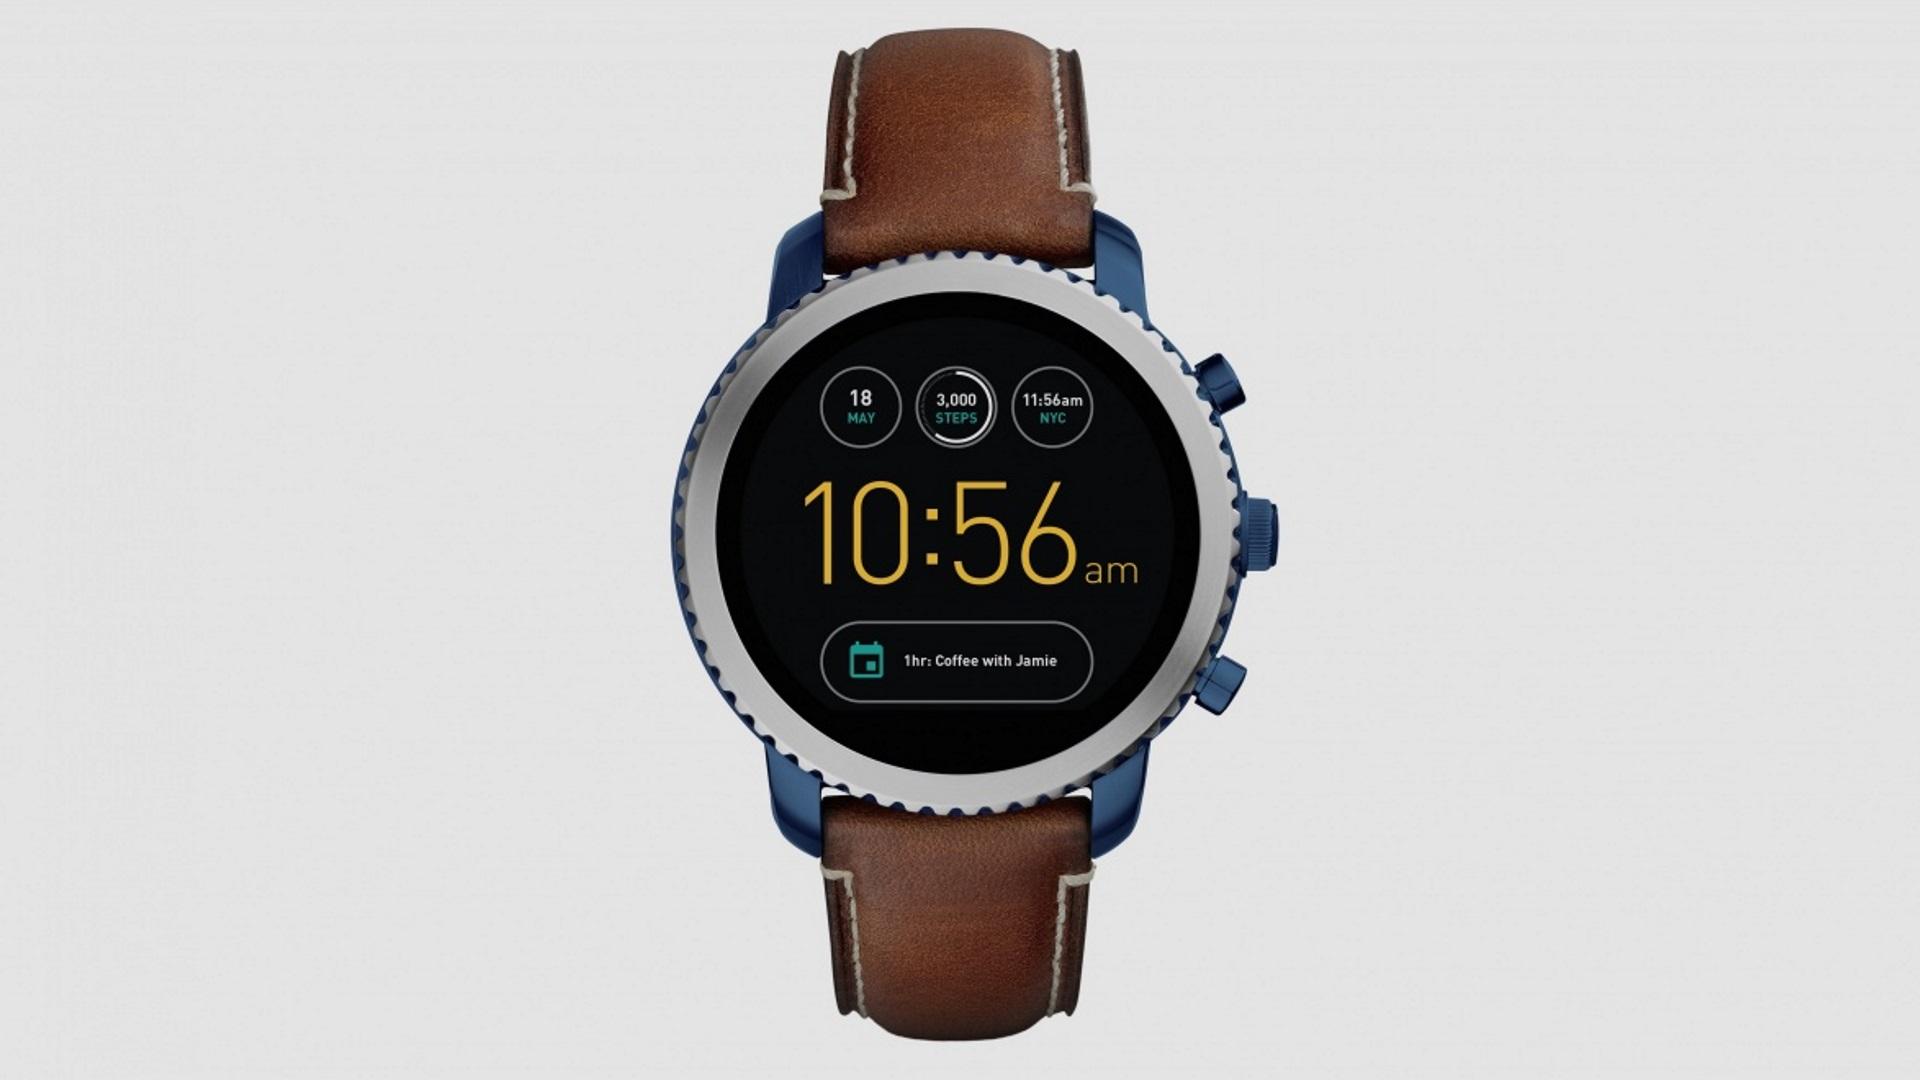 Fossil、2017年後半発売予定の新型Android Wear 2.0スマートウォッチ「Fossil Q Venture / Q Explorist」を発表